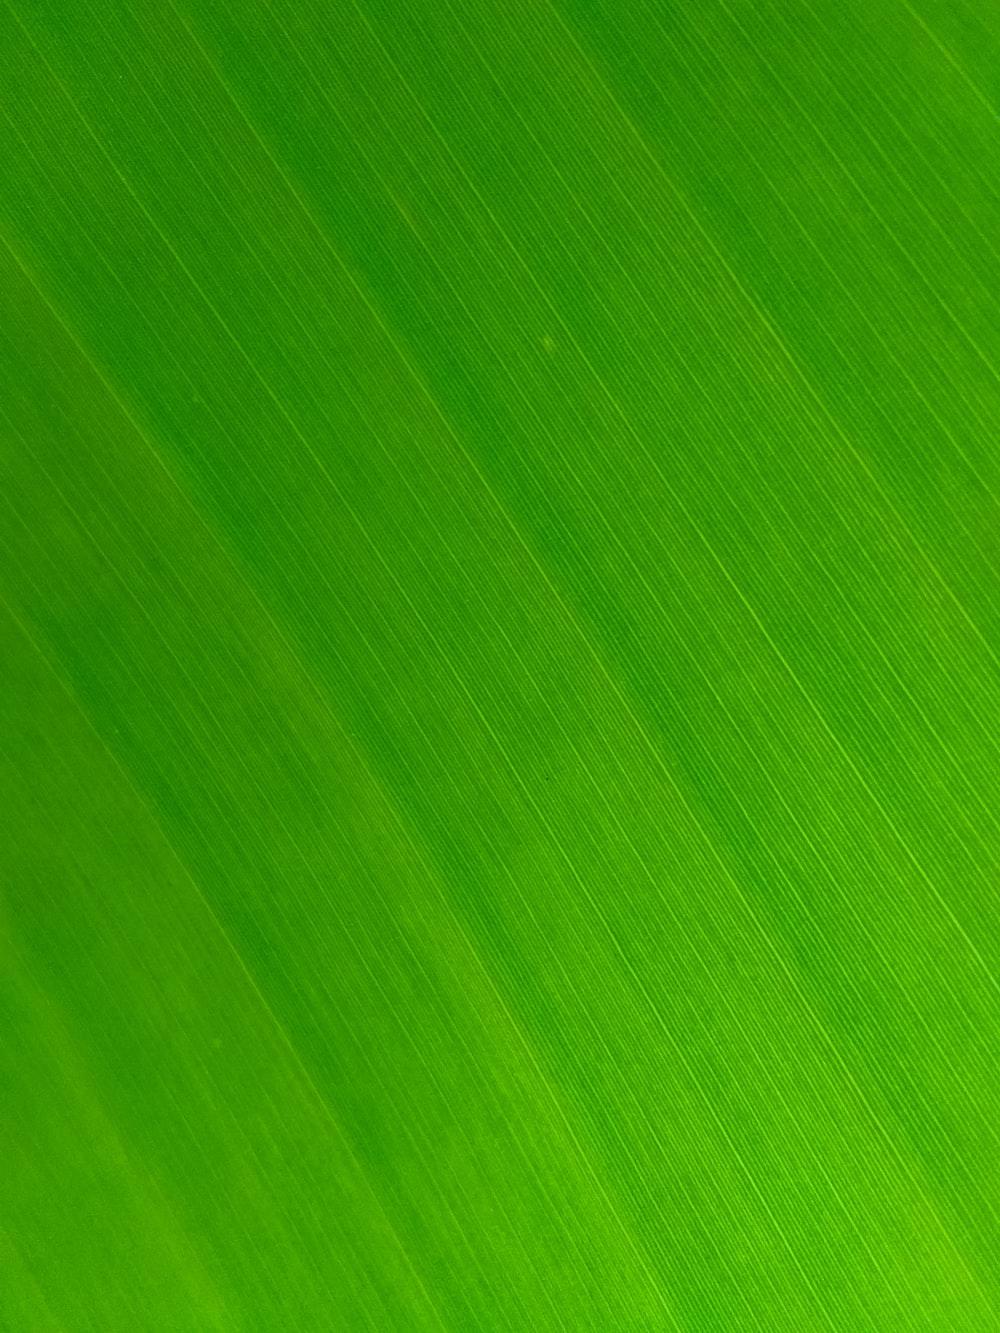 Leaf Texture Pictures Download Free Images On Unsplash